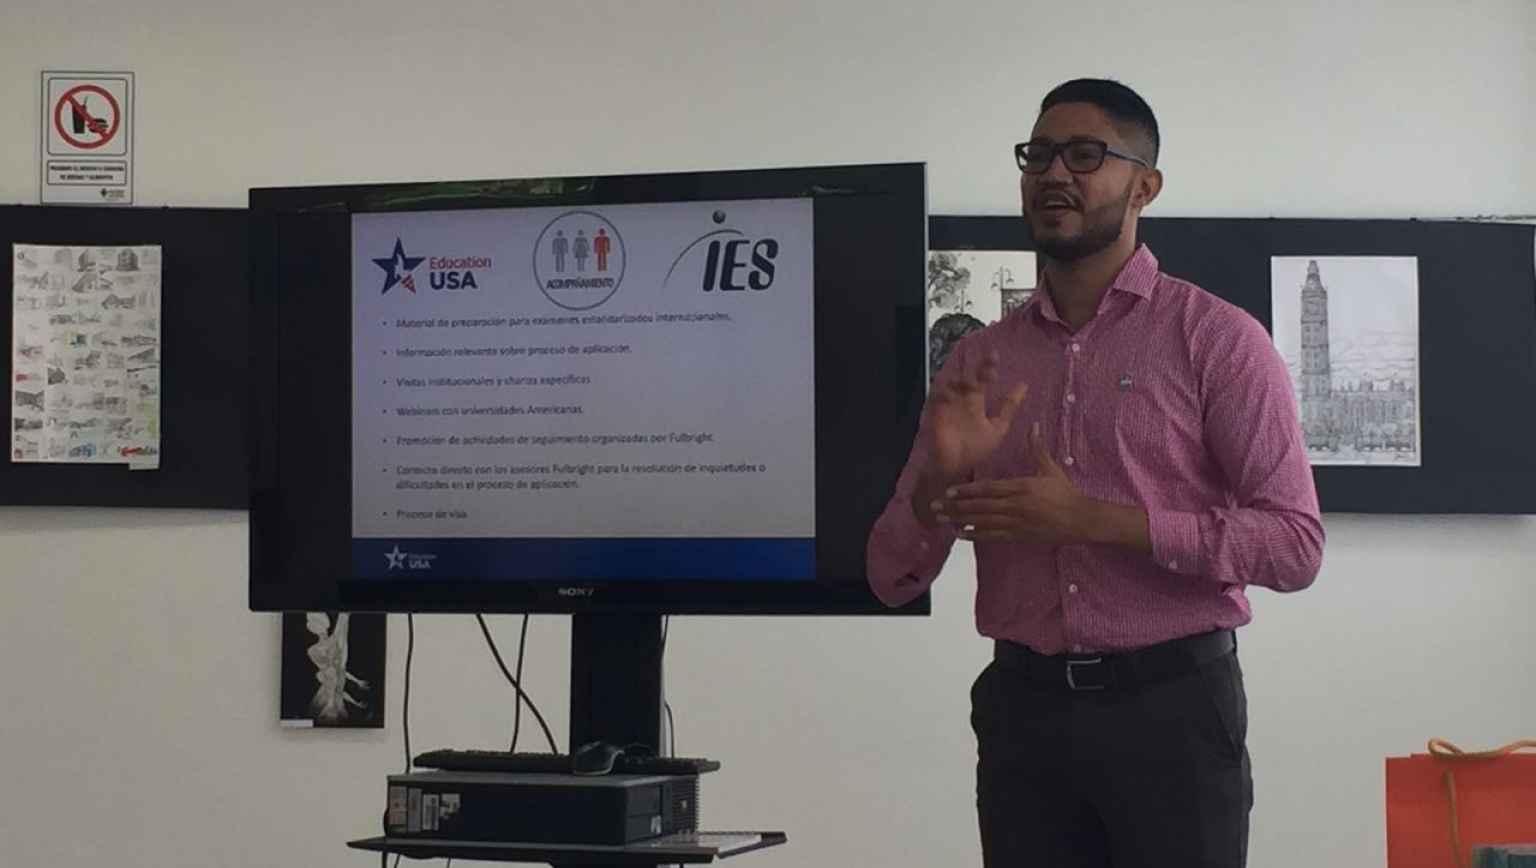 EducationUSA Adviser giving a presentation